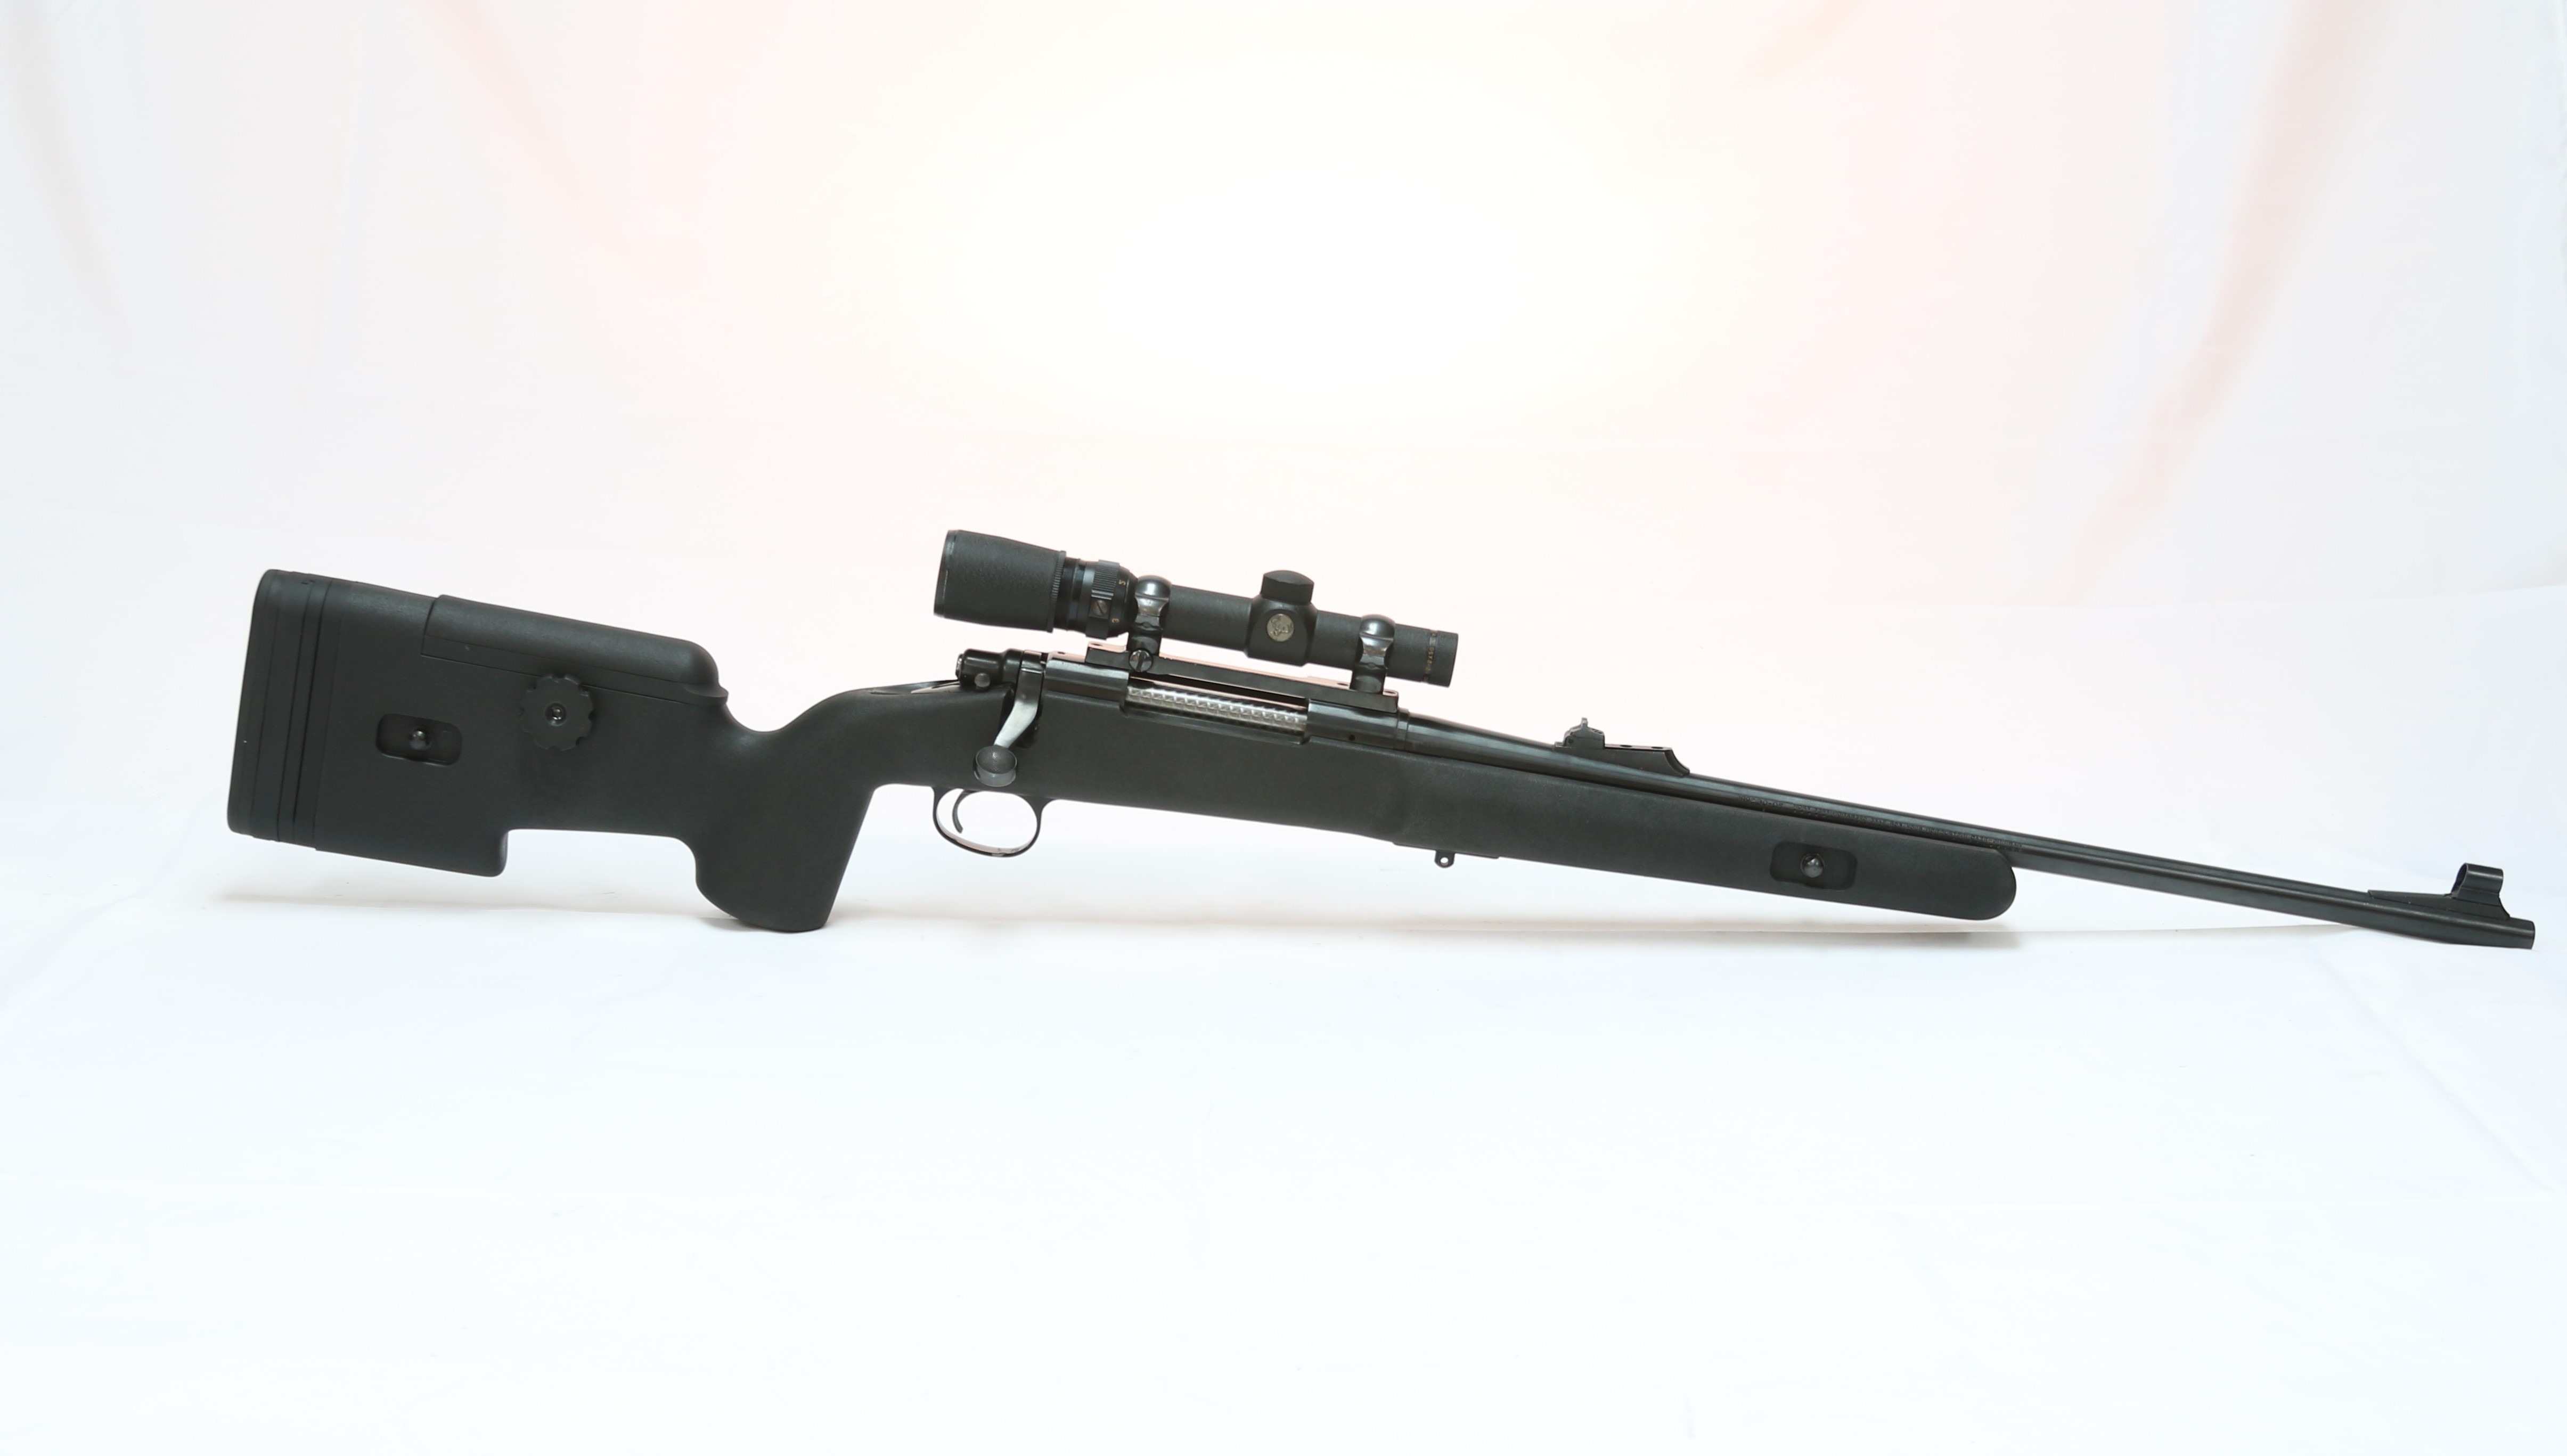 Remington 700 Sniper Stock